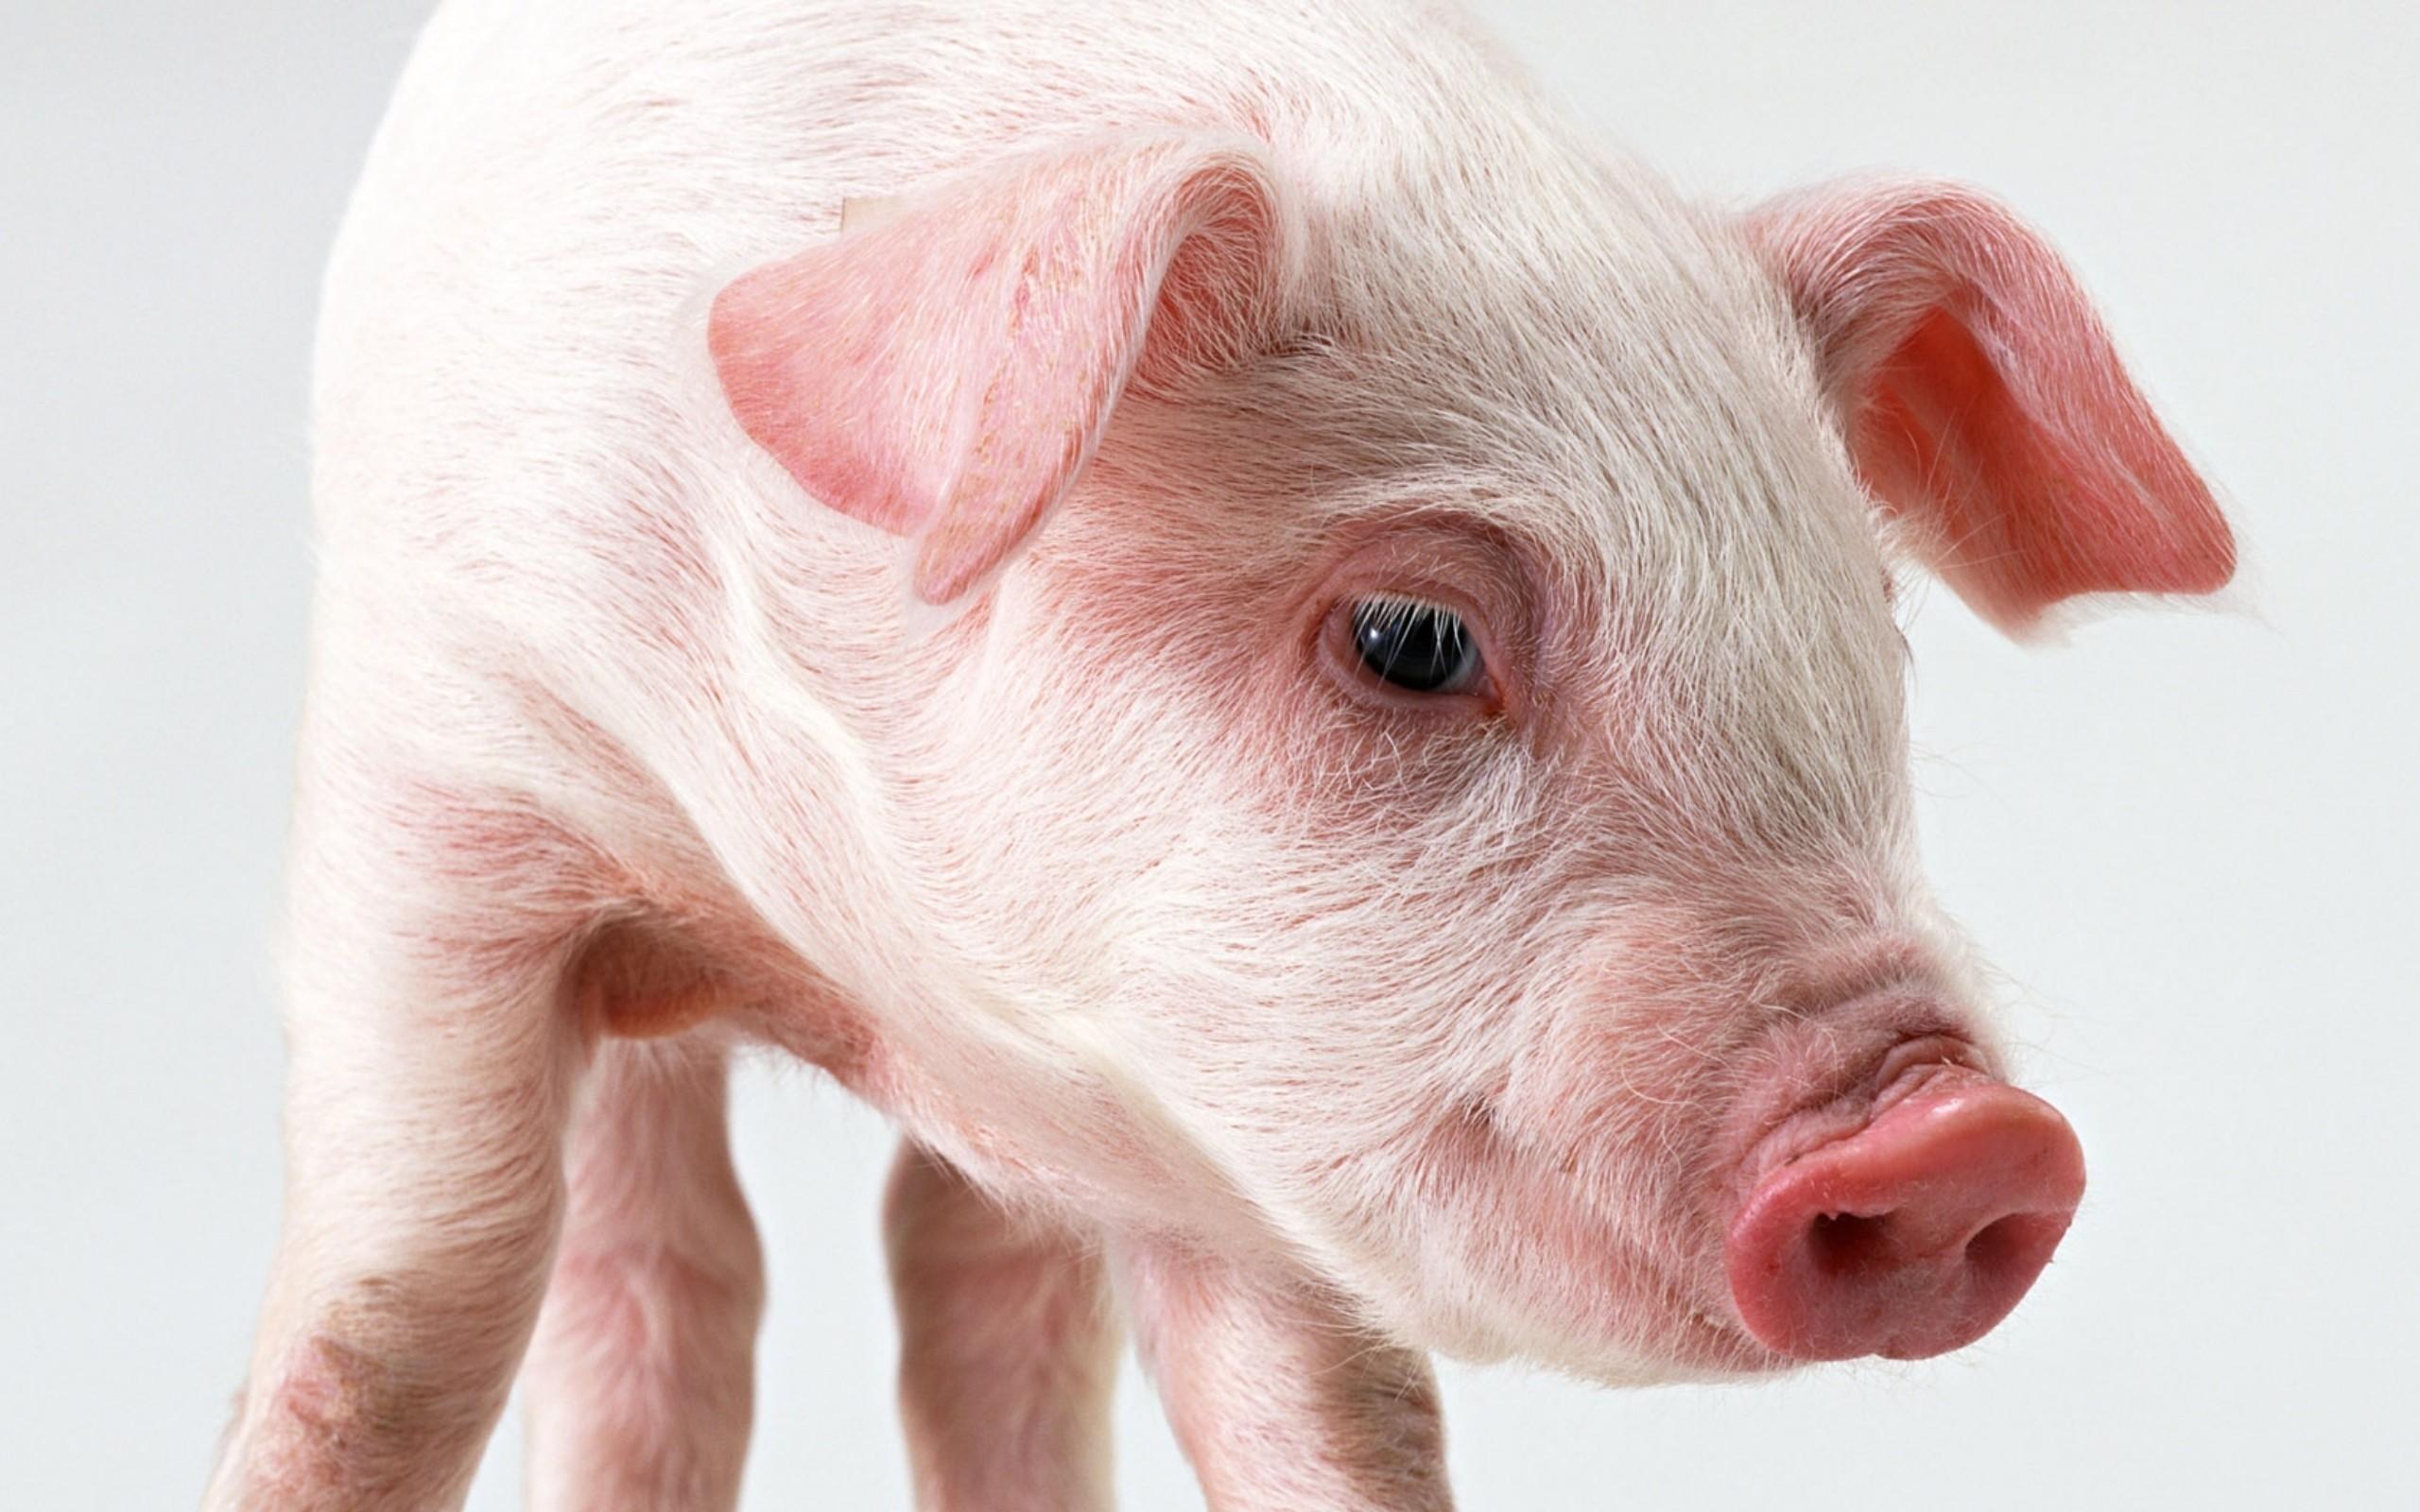 Res: 2560x1600, Animal - Pig Wallpaper